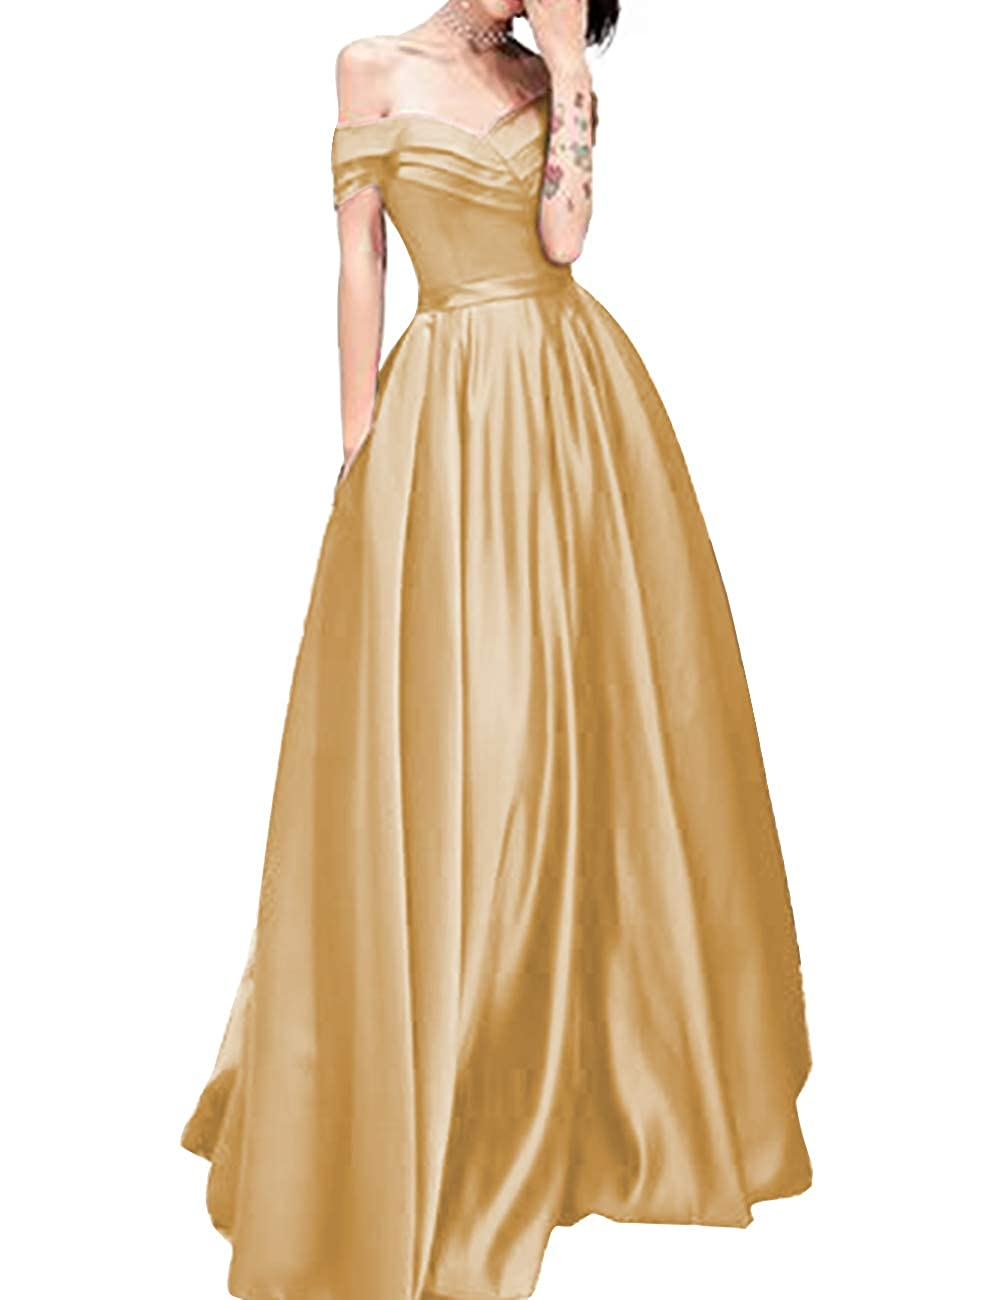 Champagne JAEDEN Prom Dresses Long Evening Dresses Formal Satin Prom Gowns Off The Shoulder Evening Dress A Line Prom Dress